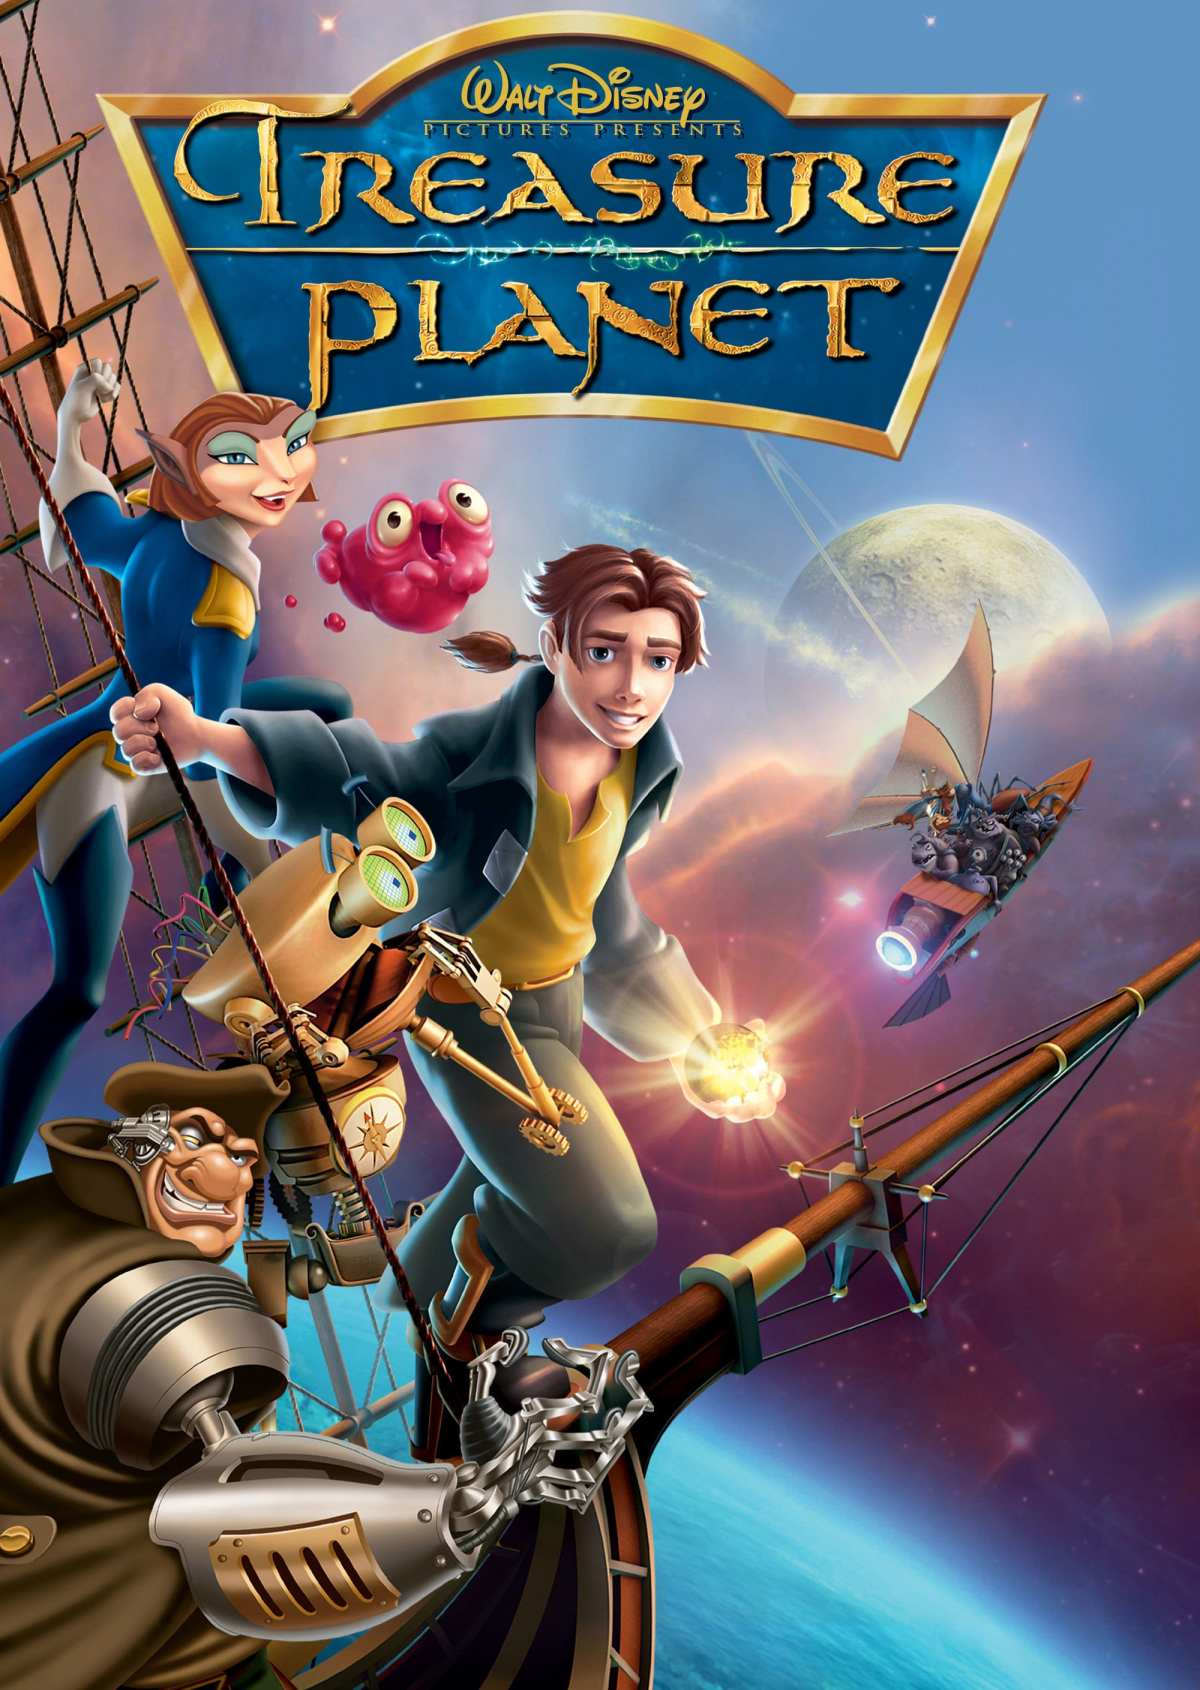 Disney's Treasure Planet movie poster.